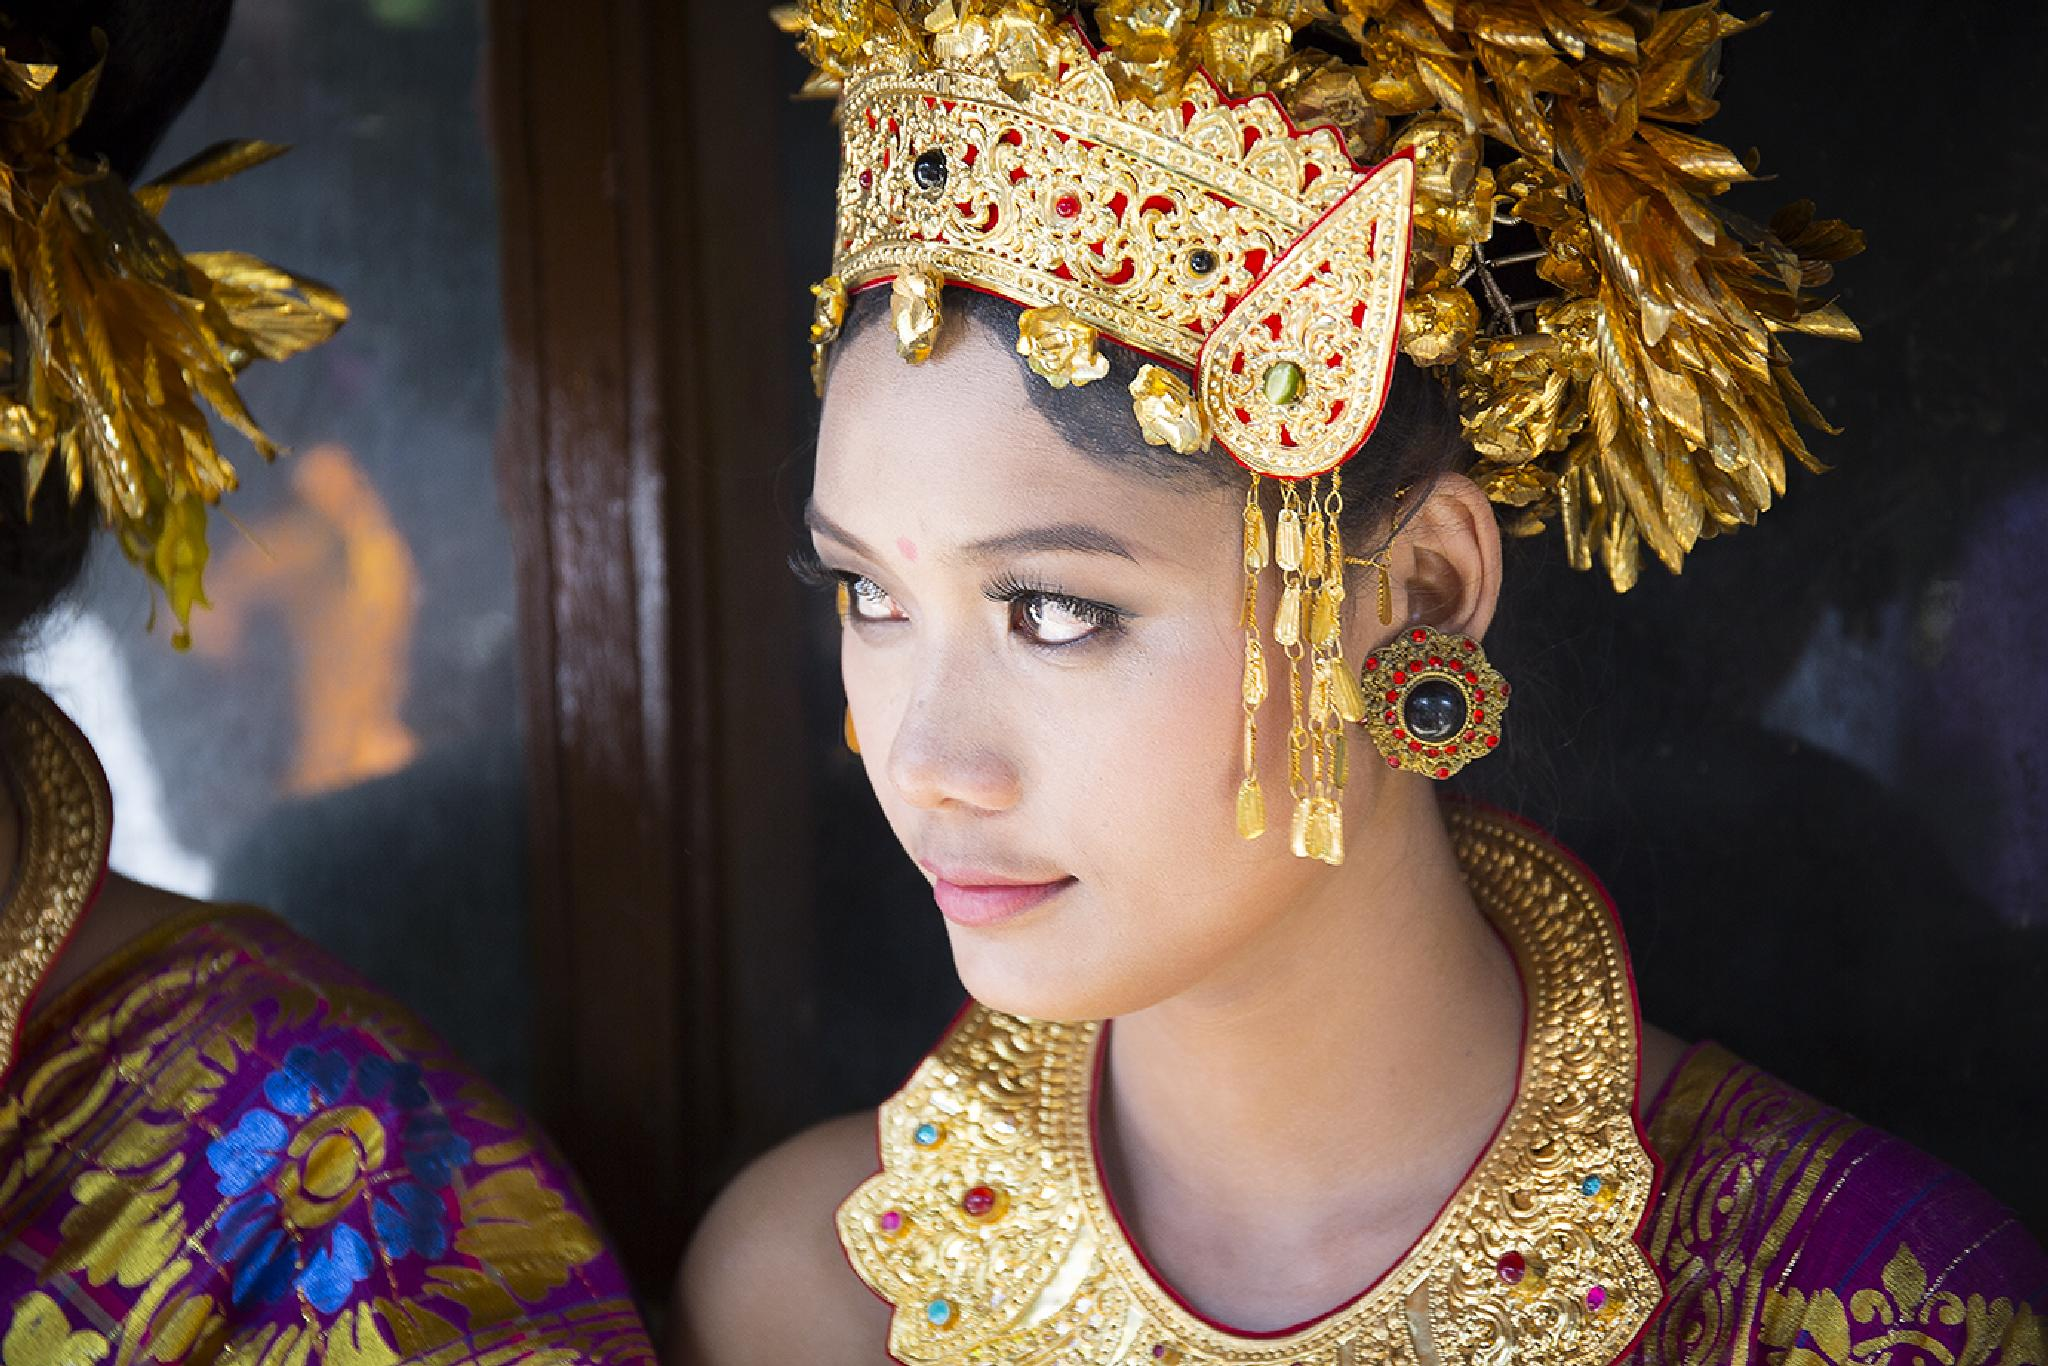 Bali Beauty by BerndKinghorst